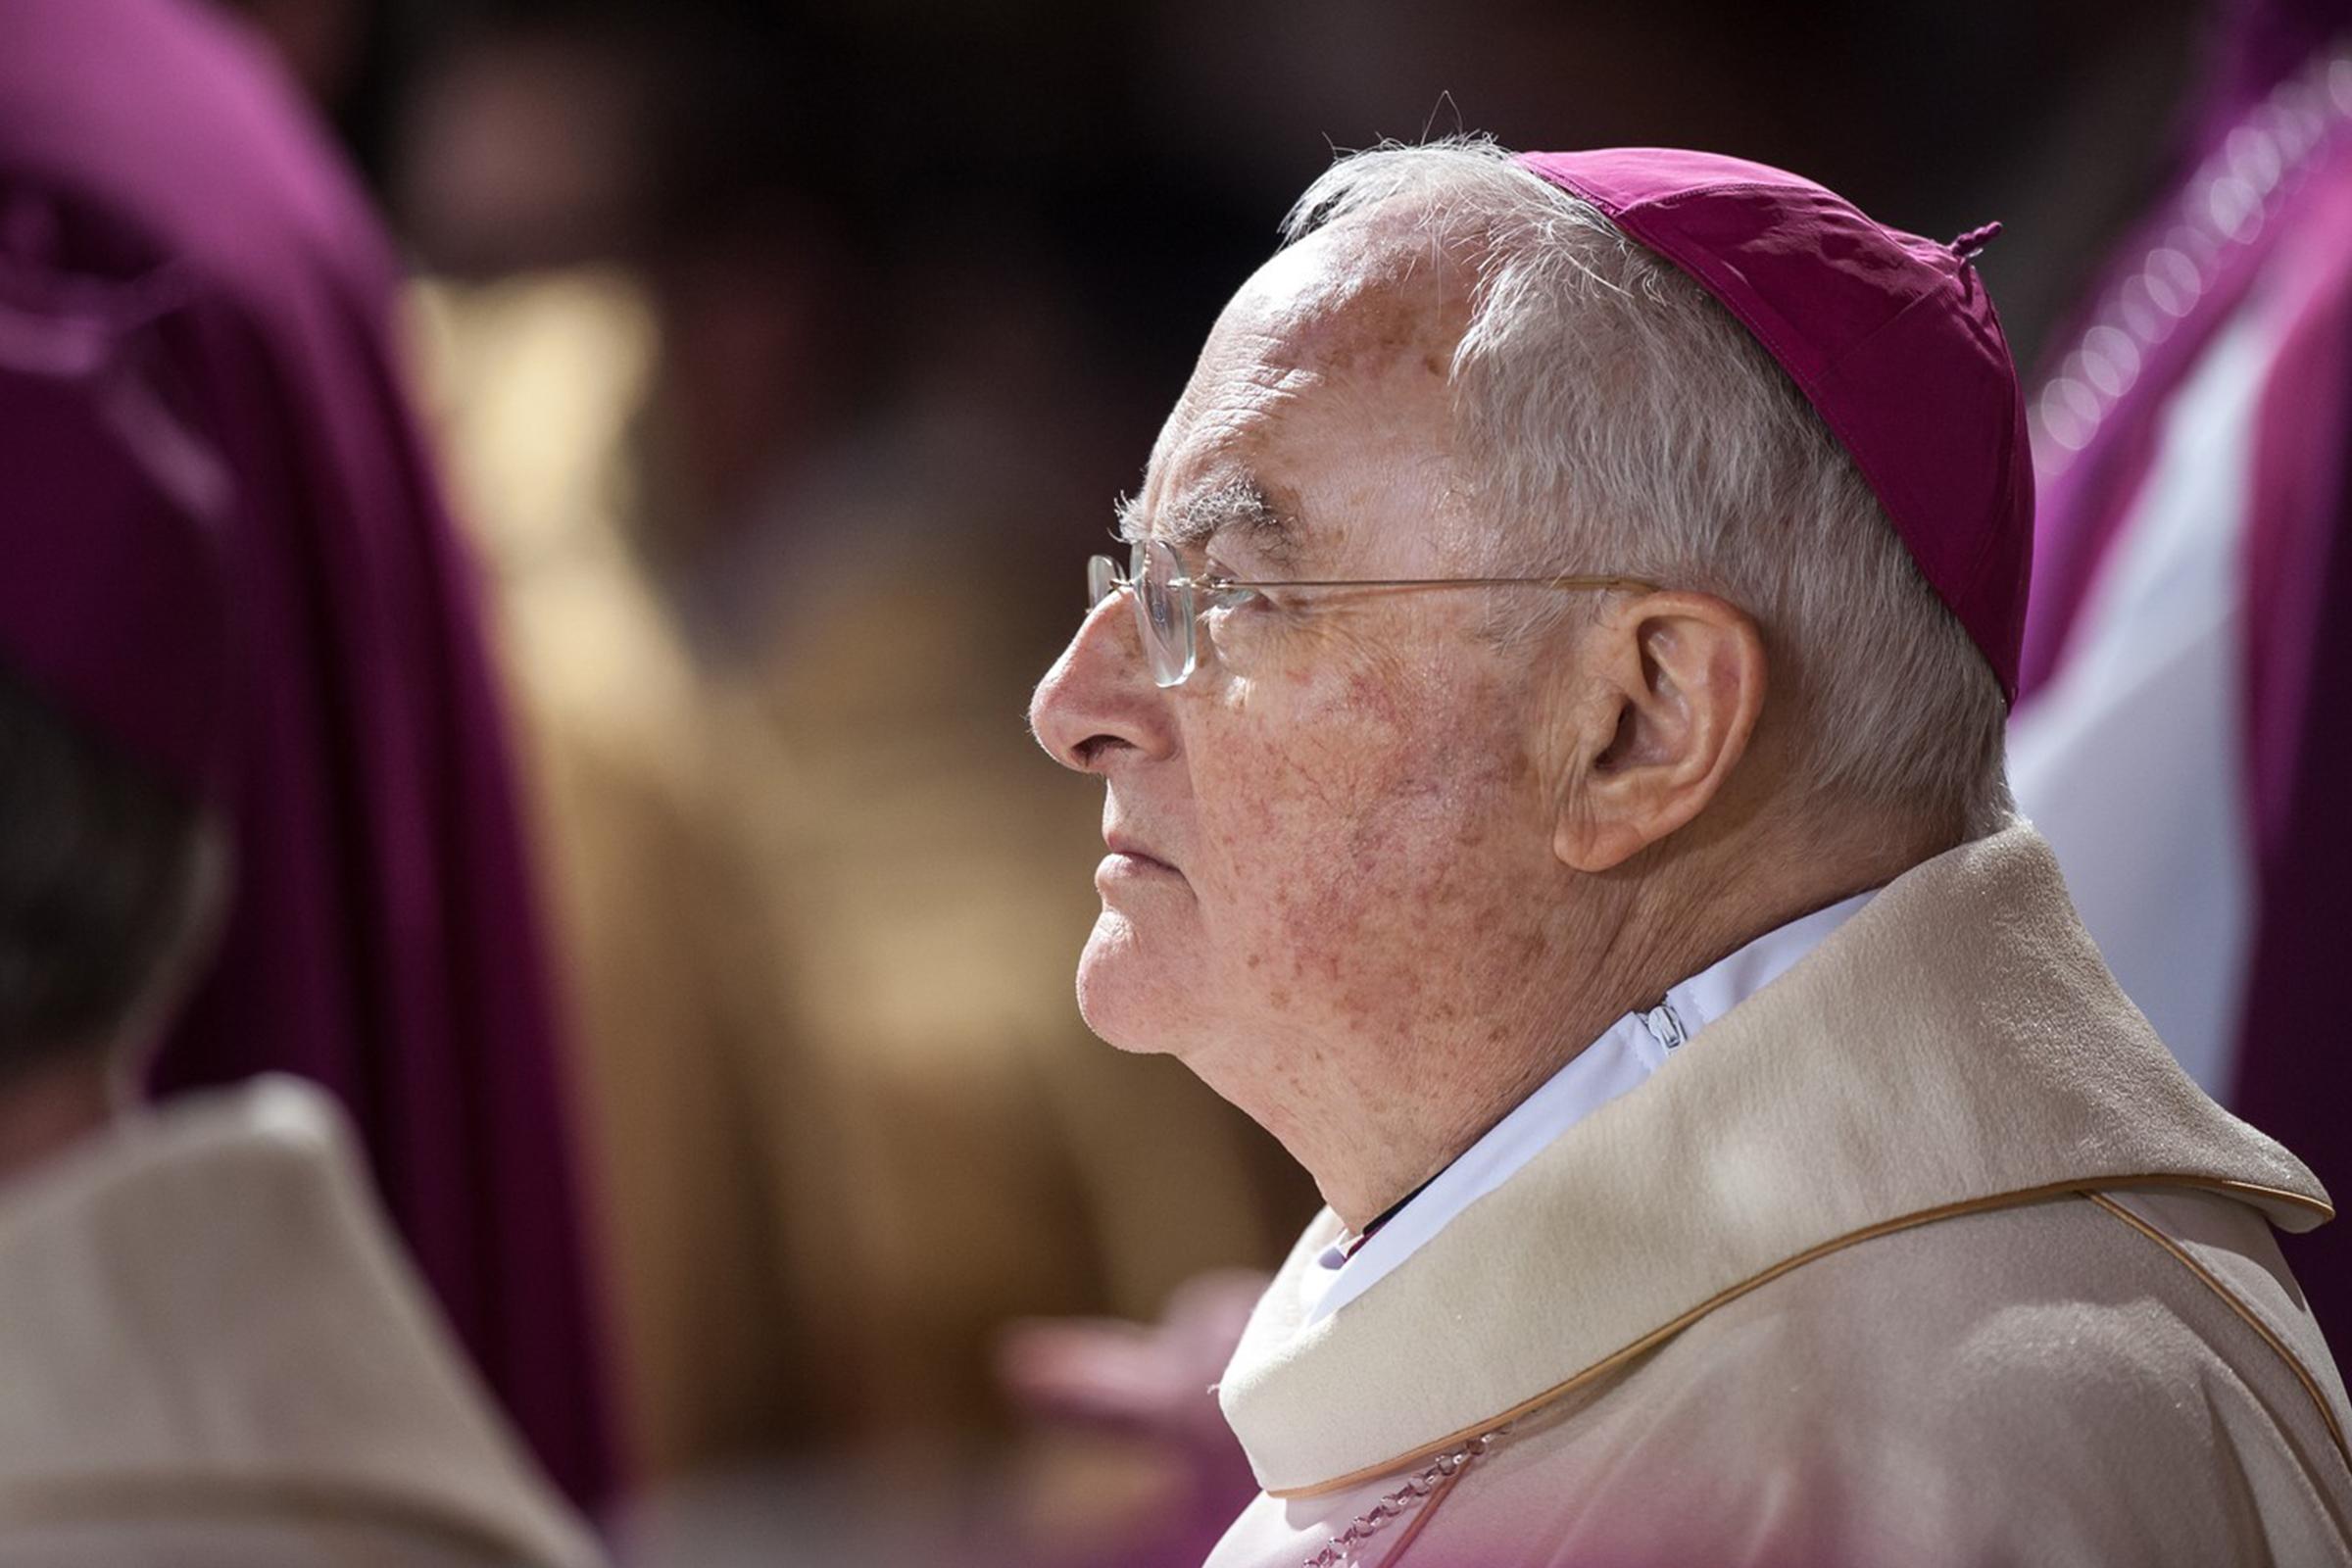 Mgr Hoser, évêque de Varsovie-Praga, envoyé spécial du Saint-Siège à Medjugorje